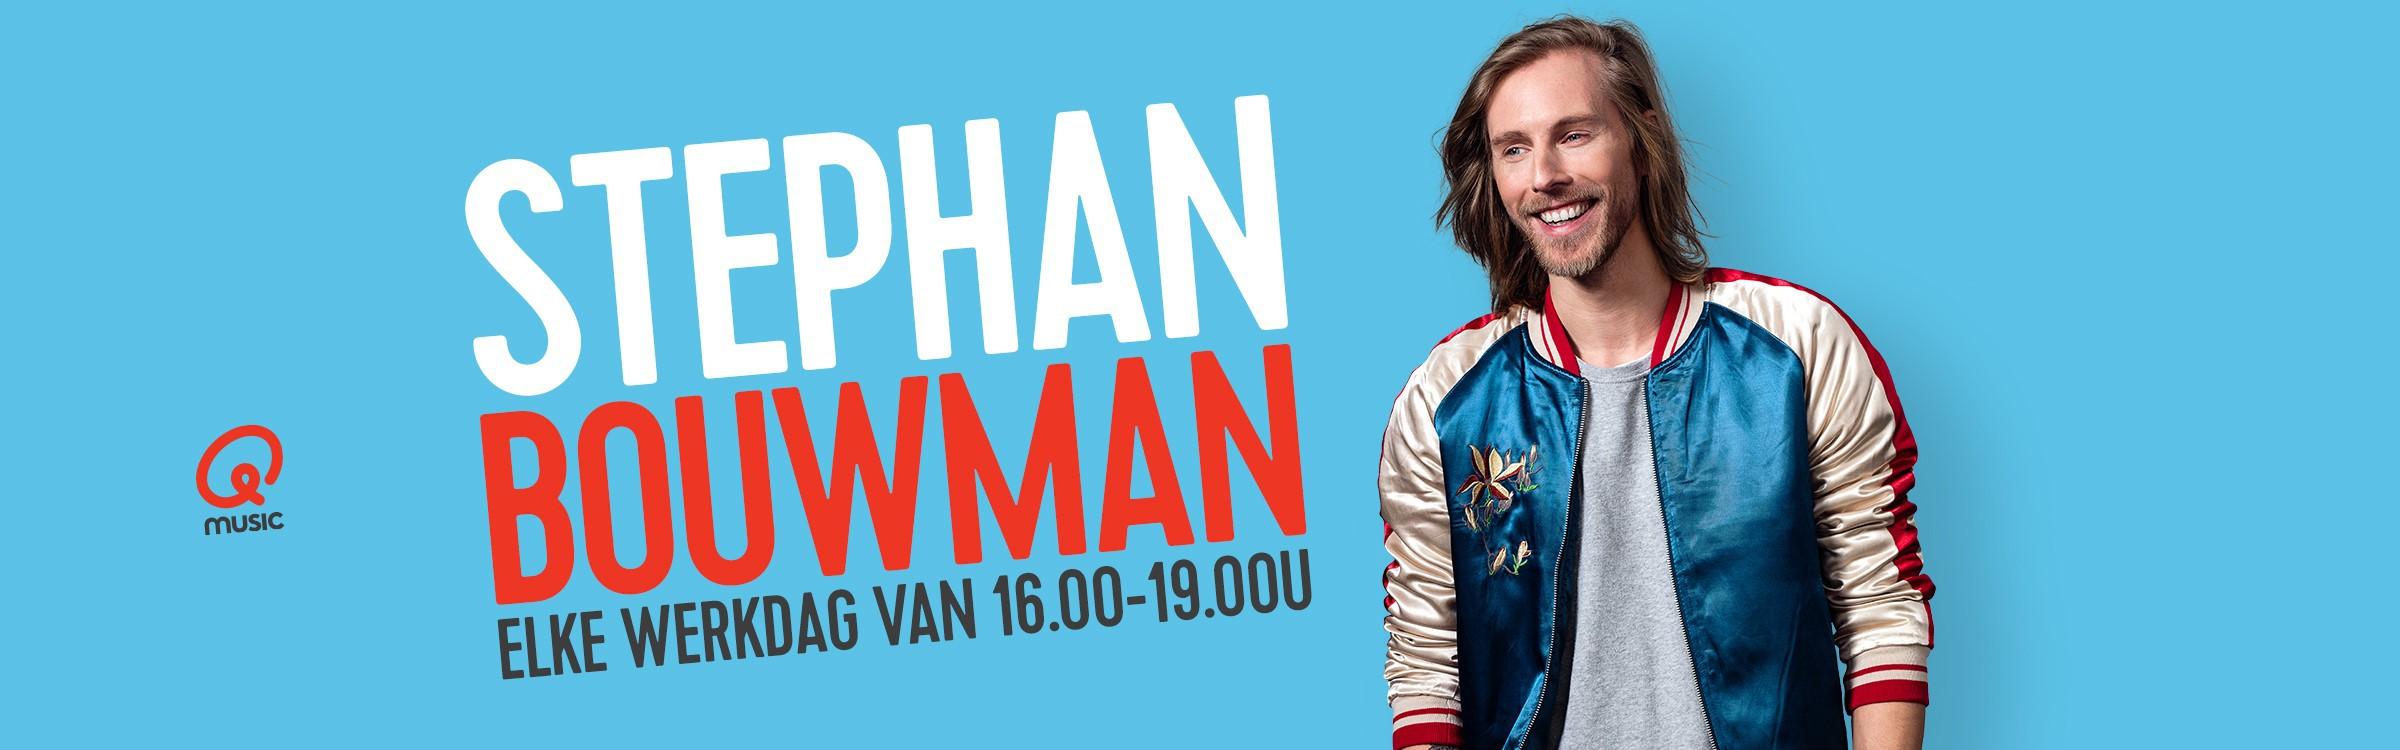 Stephan show header